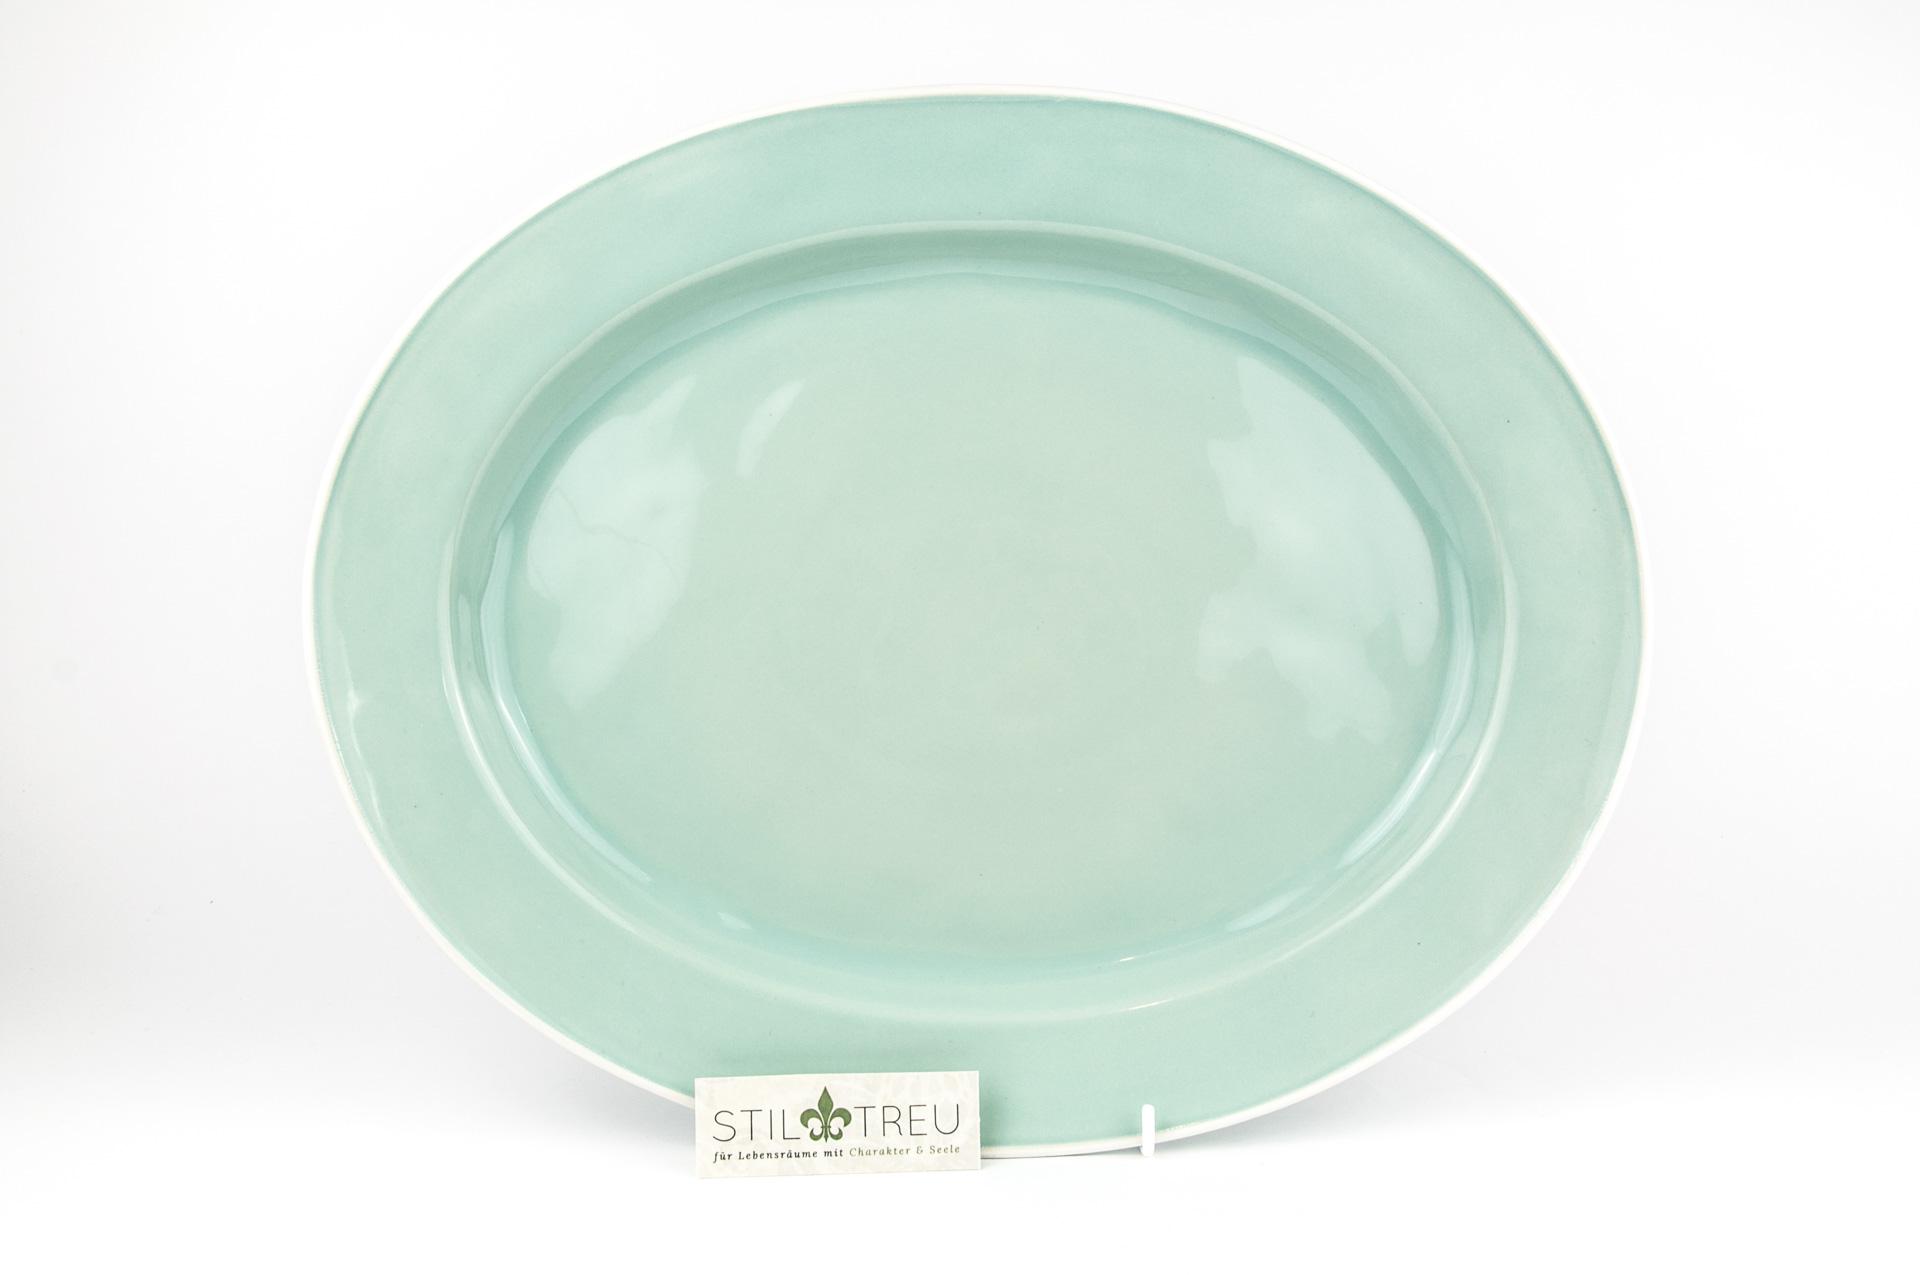 Ovale Platte Astoria, türkis, 40 cm